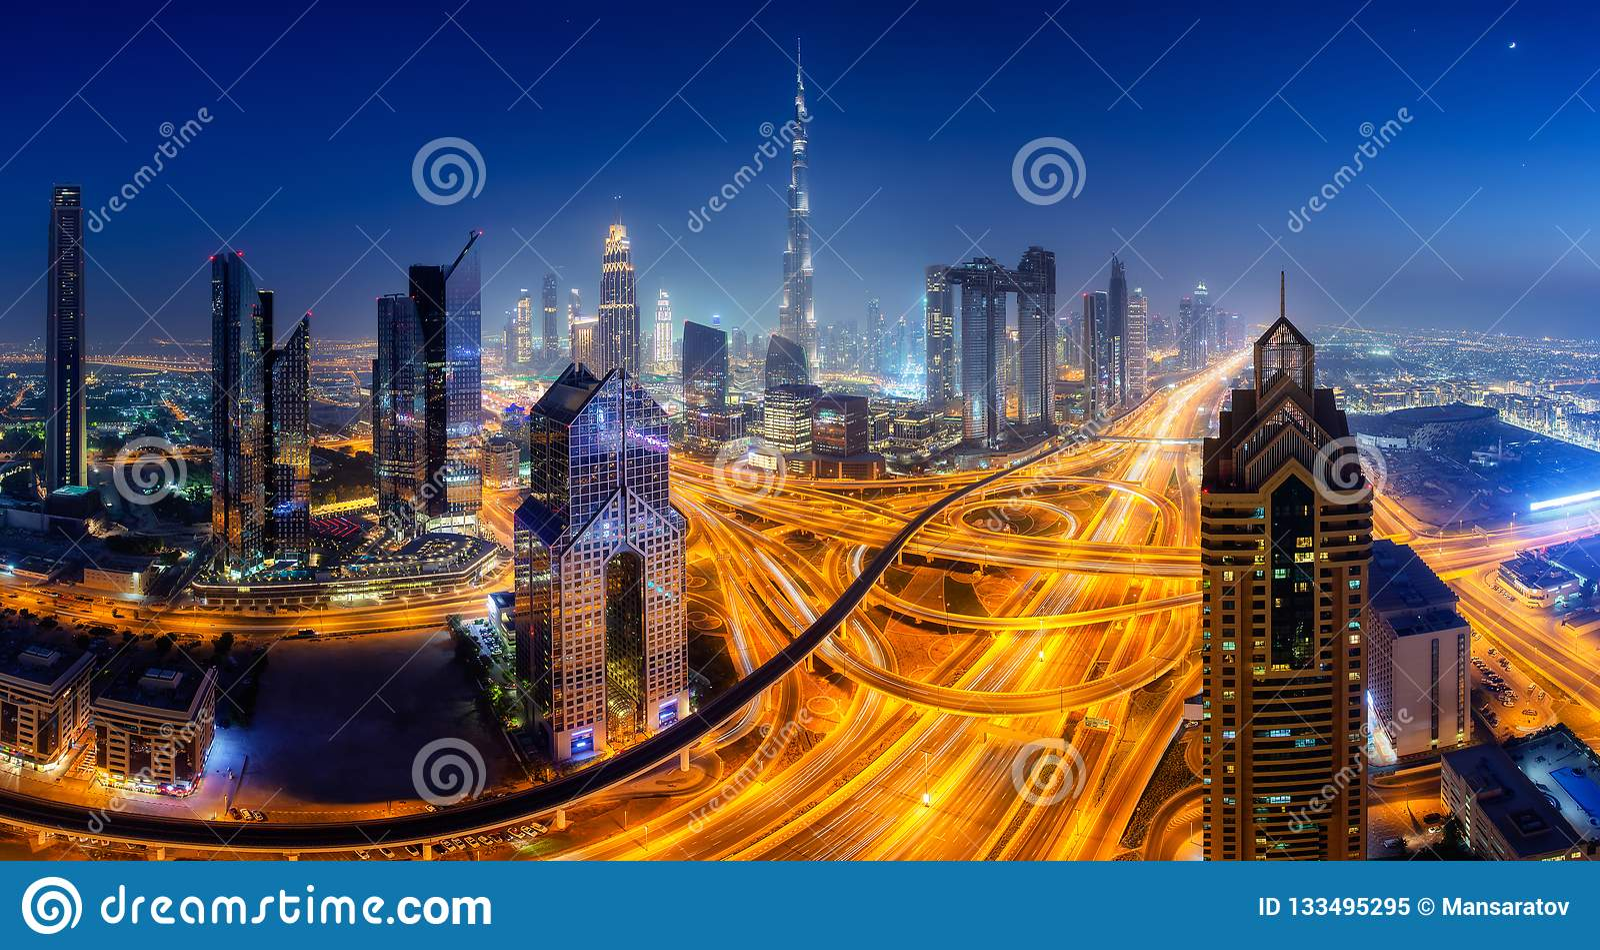 Dubai-Skyline, im Stadtzentrum gelegenes Stadtzentrum